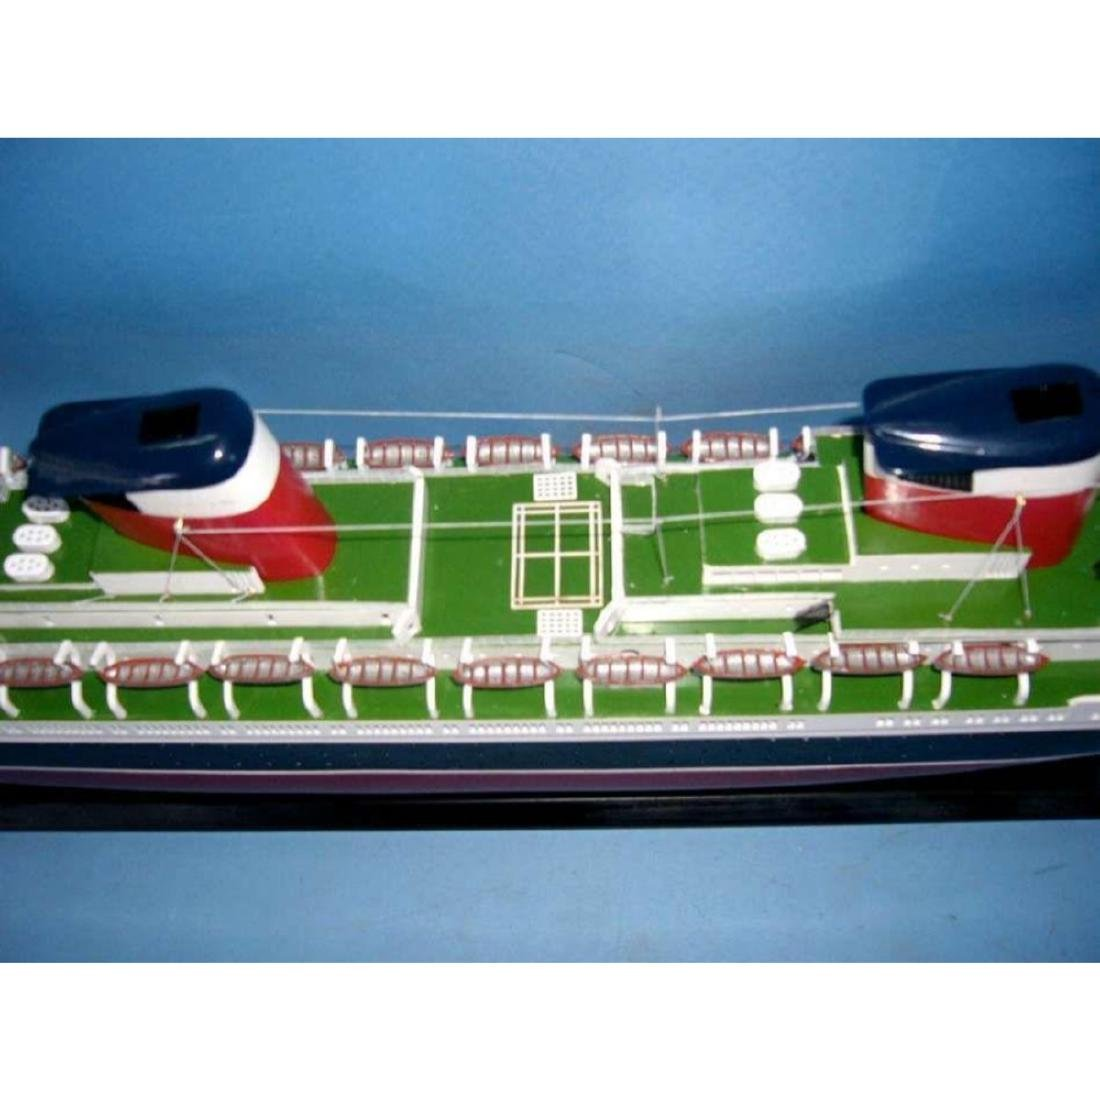 "SS United States Limited Model Cruise Ship 40"" w/ LED - 6"